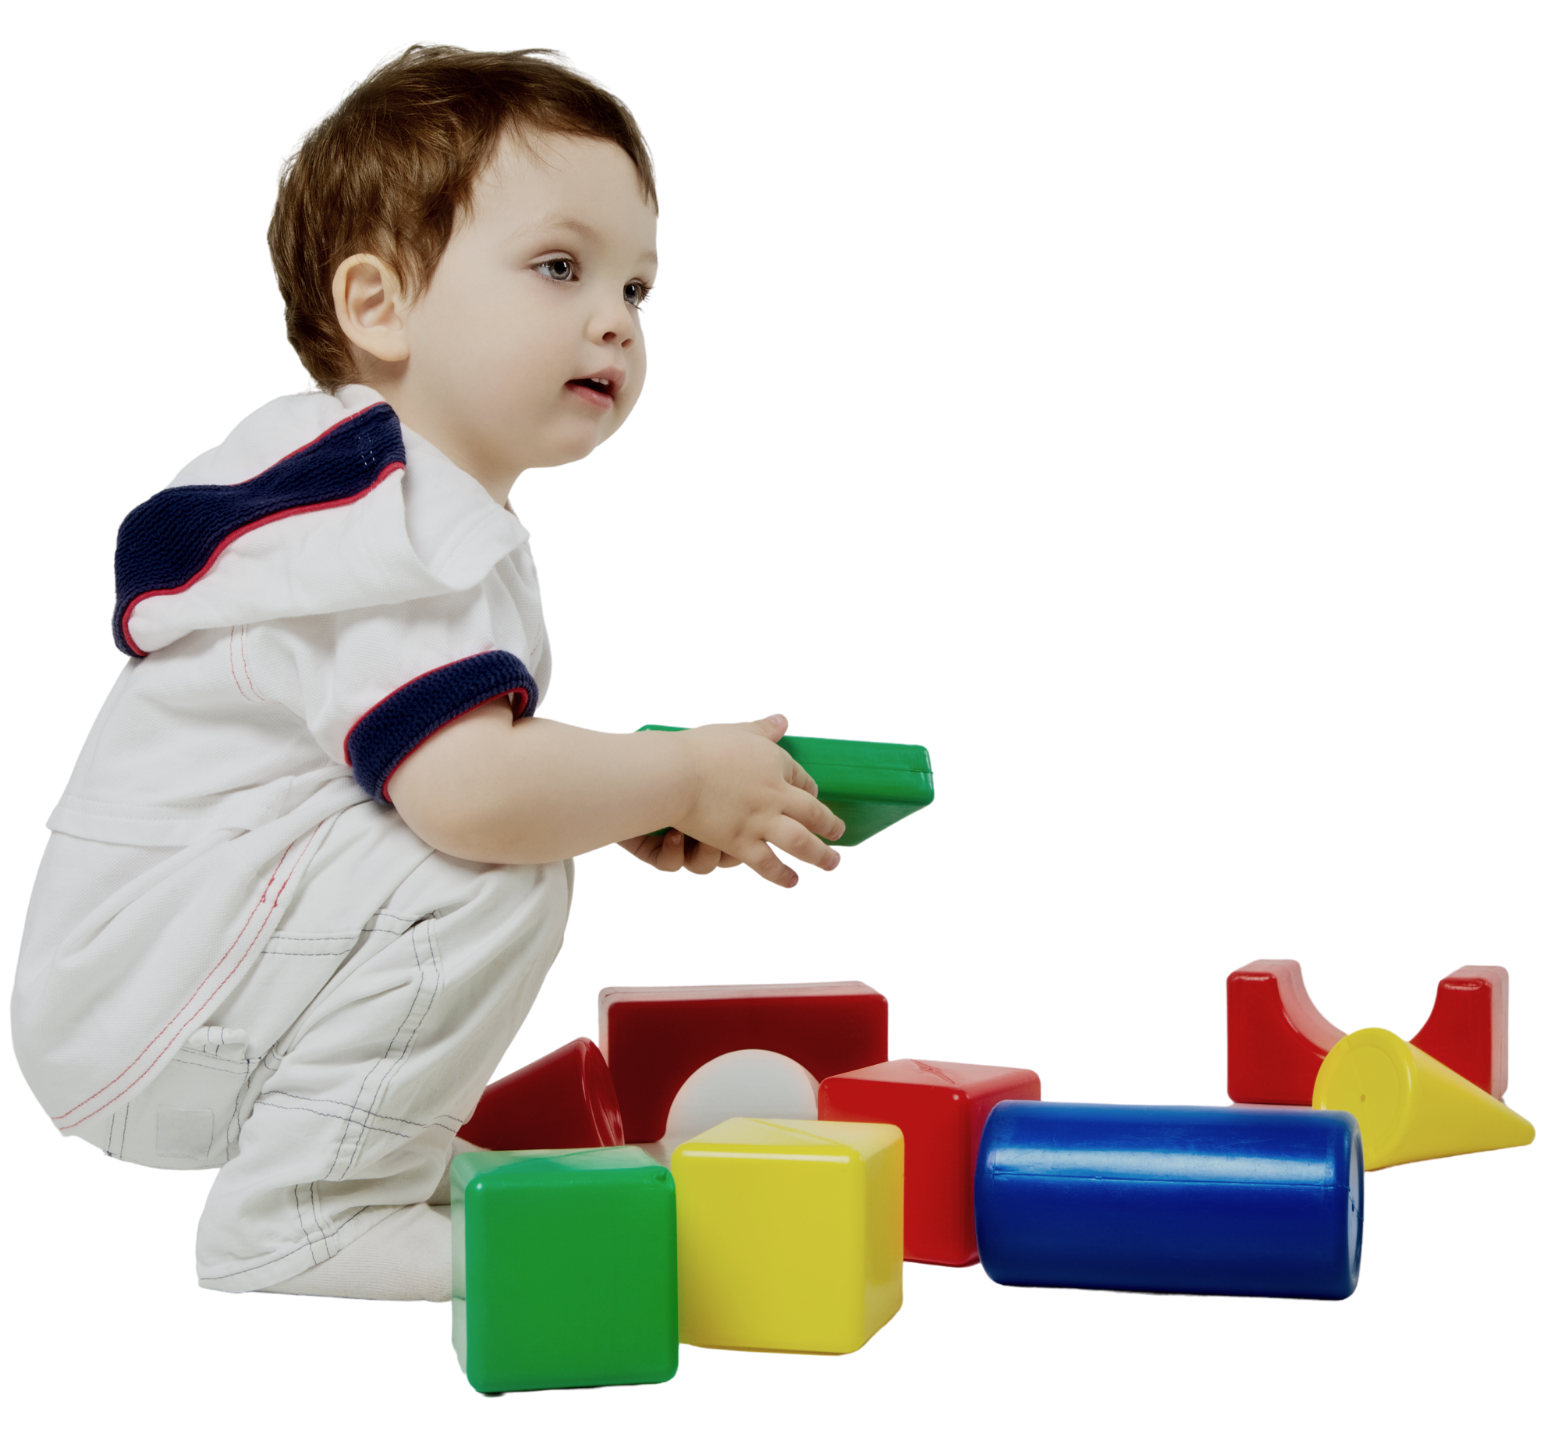 ChildCare_Child Playing_nobackground-1